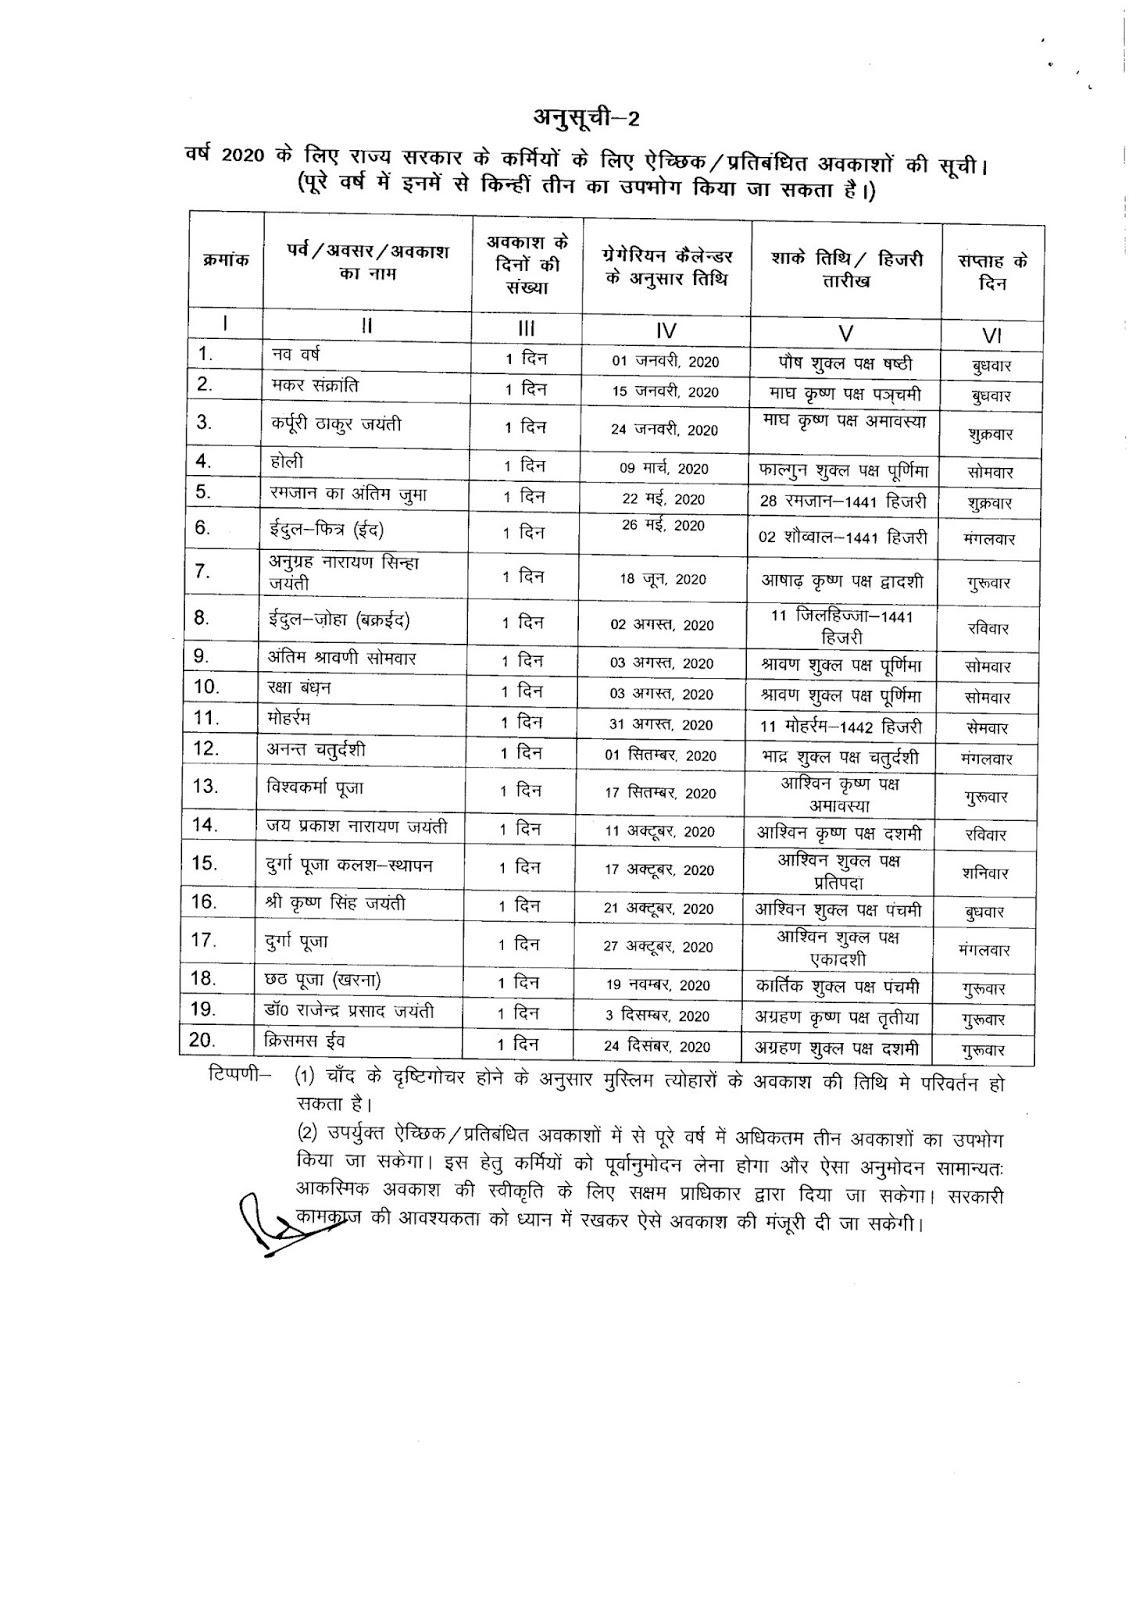 Bihar Government Calendar 2020 #educratsweb within Bihar Government Calendar 2020